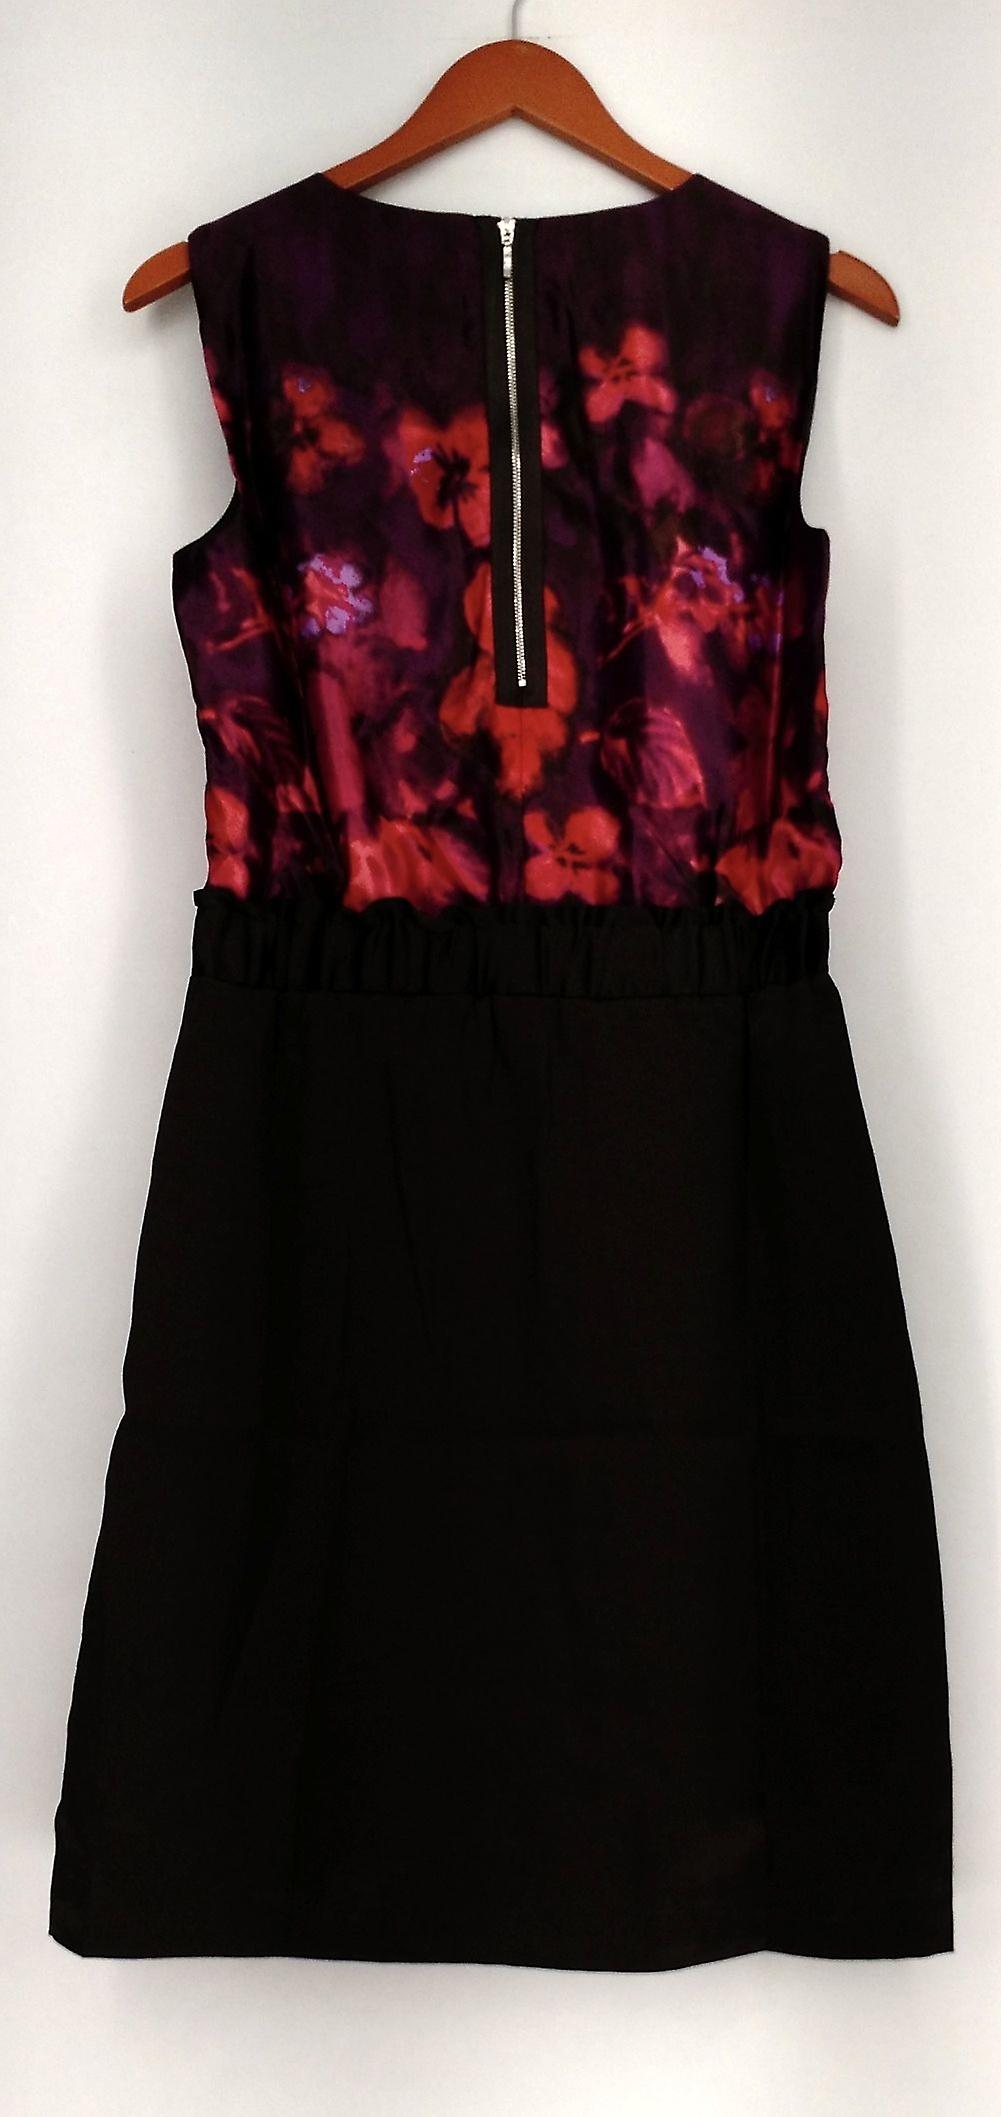 Kelly by Clinton Kelly Dress Cap Slv Floral Printed Dress Purple/ Red A218739 wvtjaM